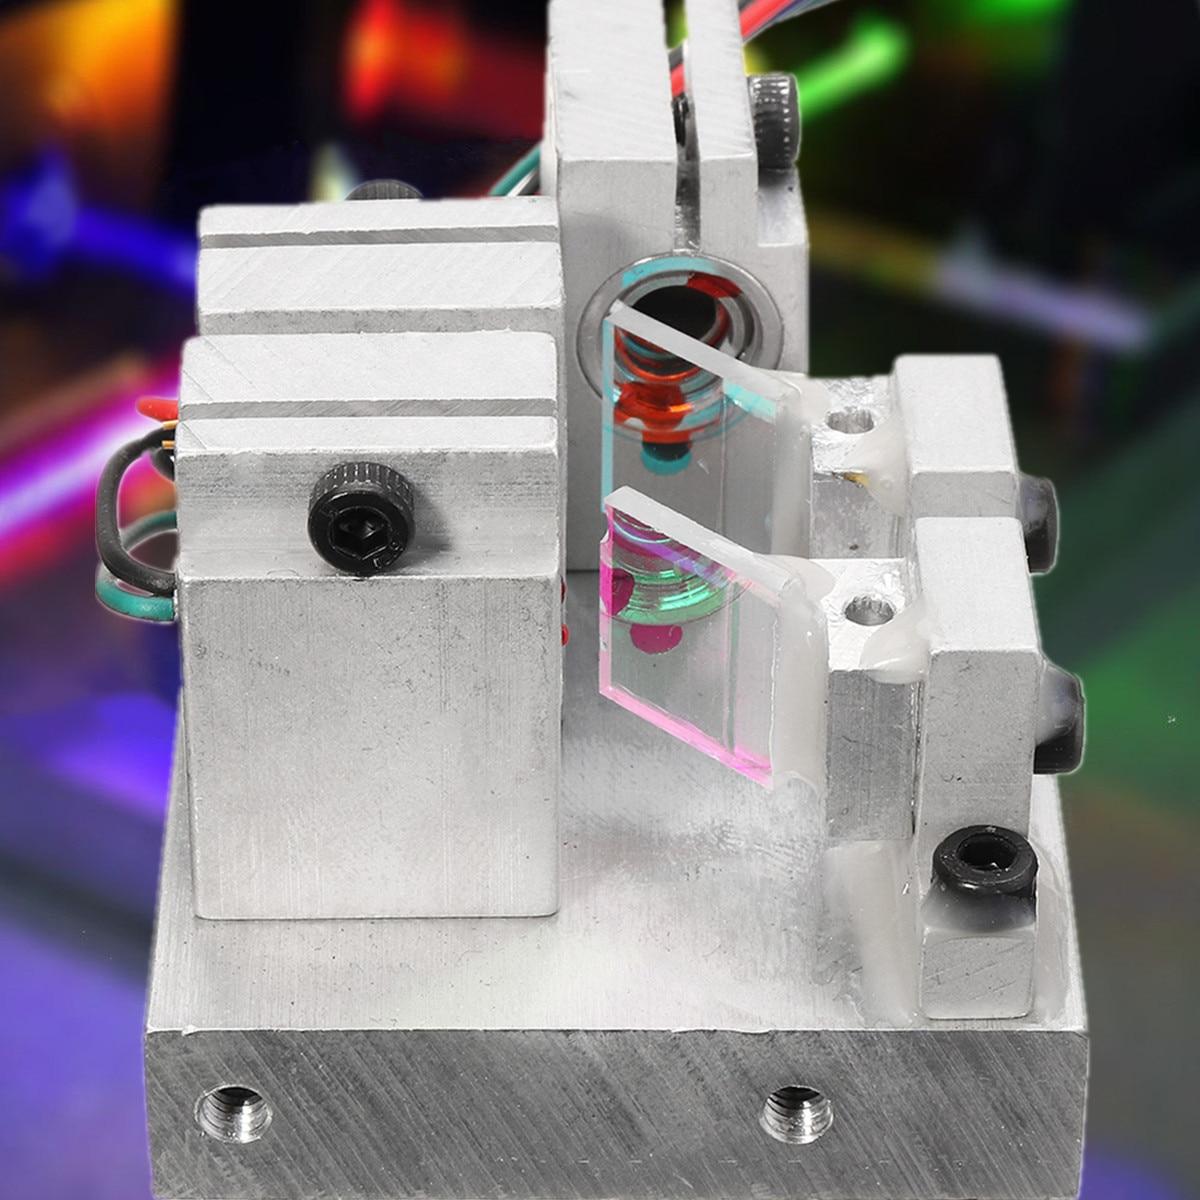 RGB 300mW White Laser Module 638nm+520nm+450nm With TTL Driver Board Modulation Temperature Protection Precision Science